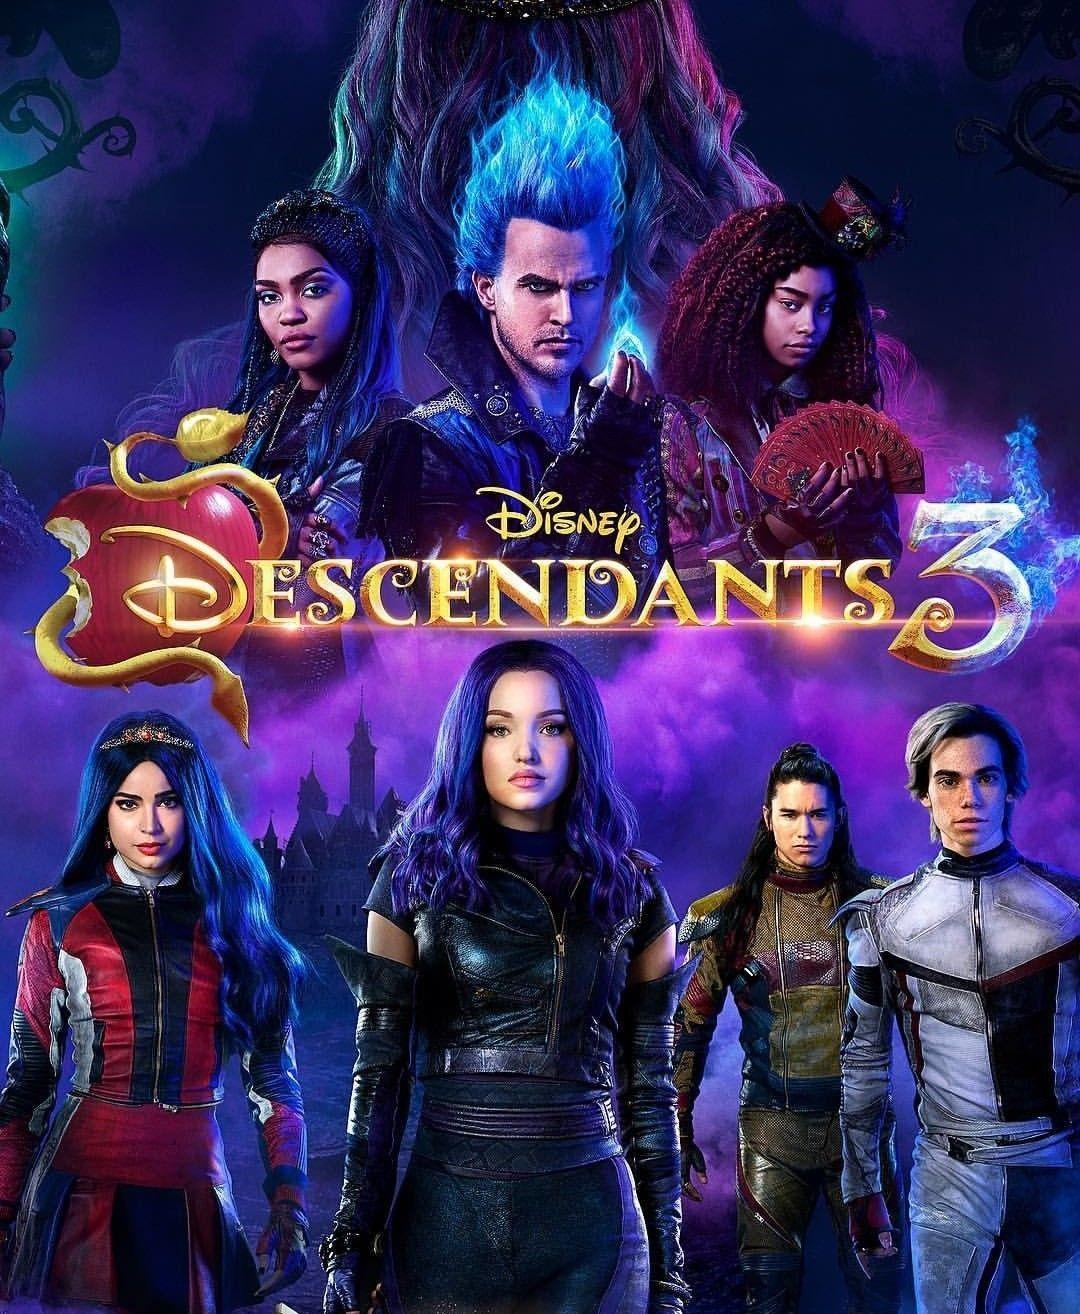 Descendants3 In 2020 Disney Decendants Disney Channel Descendants Disney Descendants 3